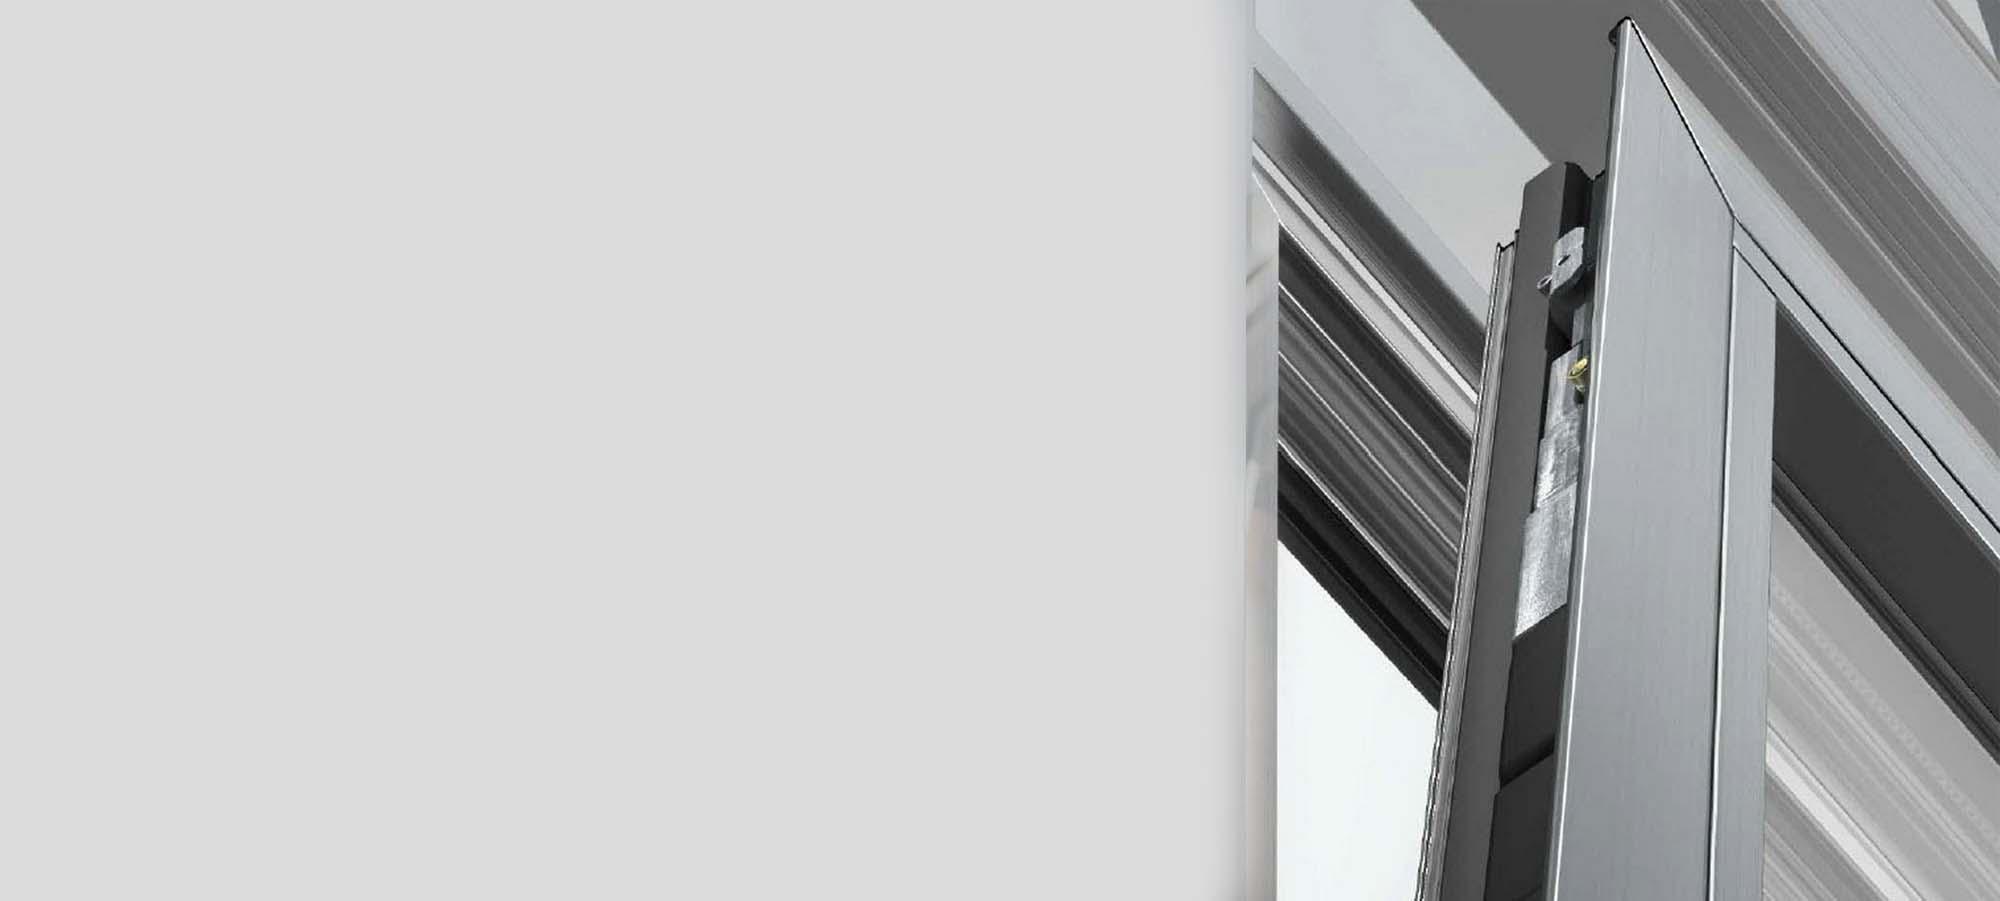 Алюминиевые окна от завода изготовителя Интеграл